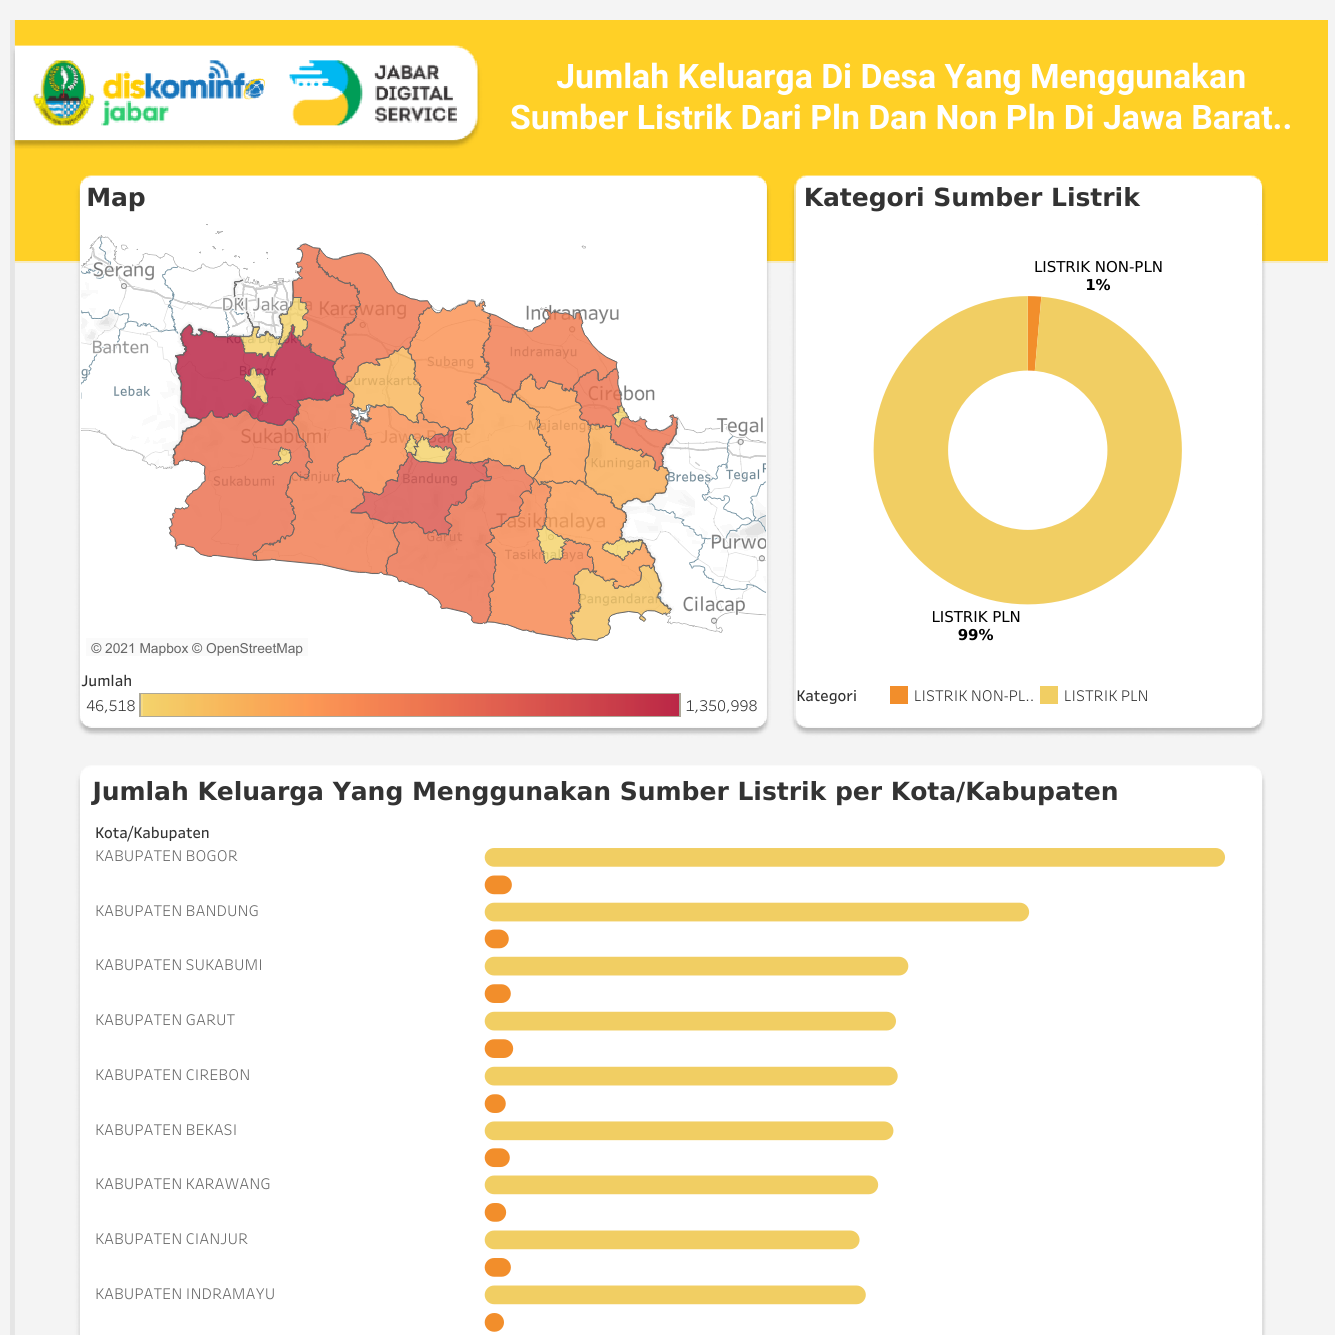 Jumlah Keluarga Di Desa Yang Menggunakan Sumber Listrik Pln Dan Non Pln Di Jawa Barat Tahun 2020